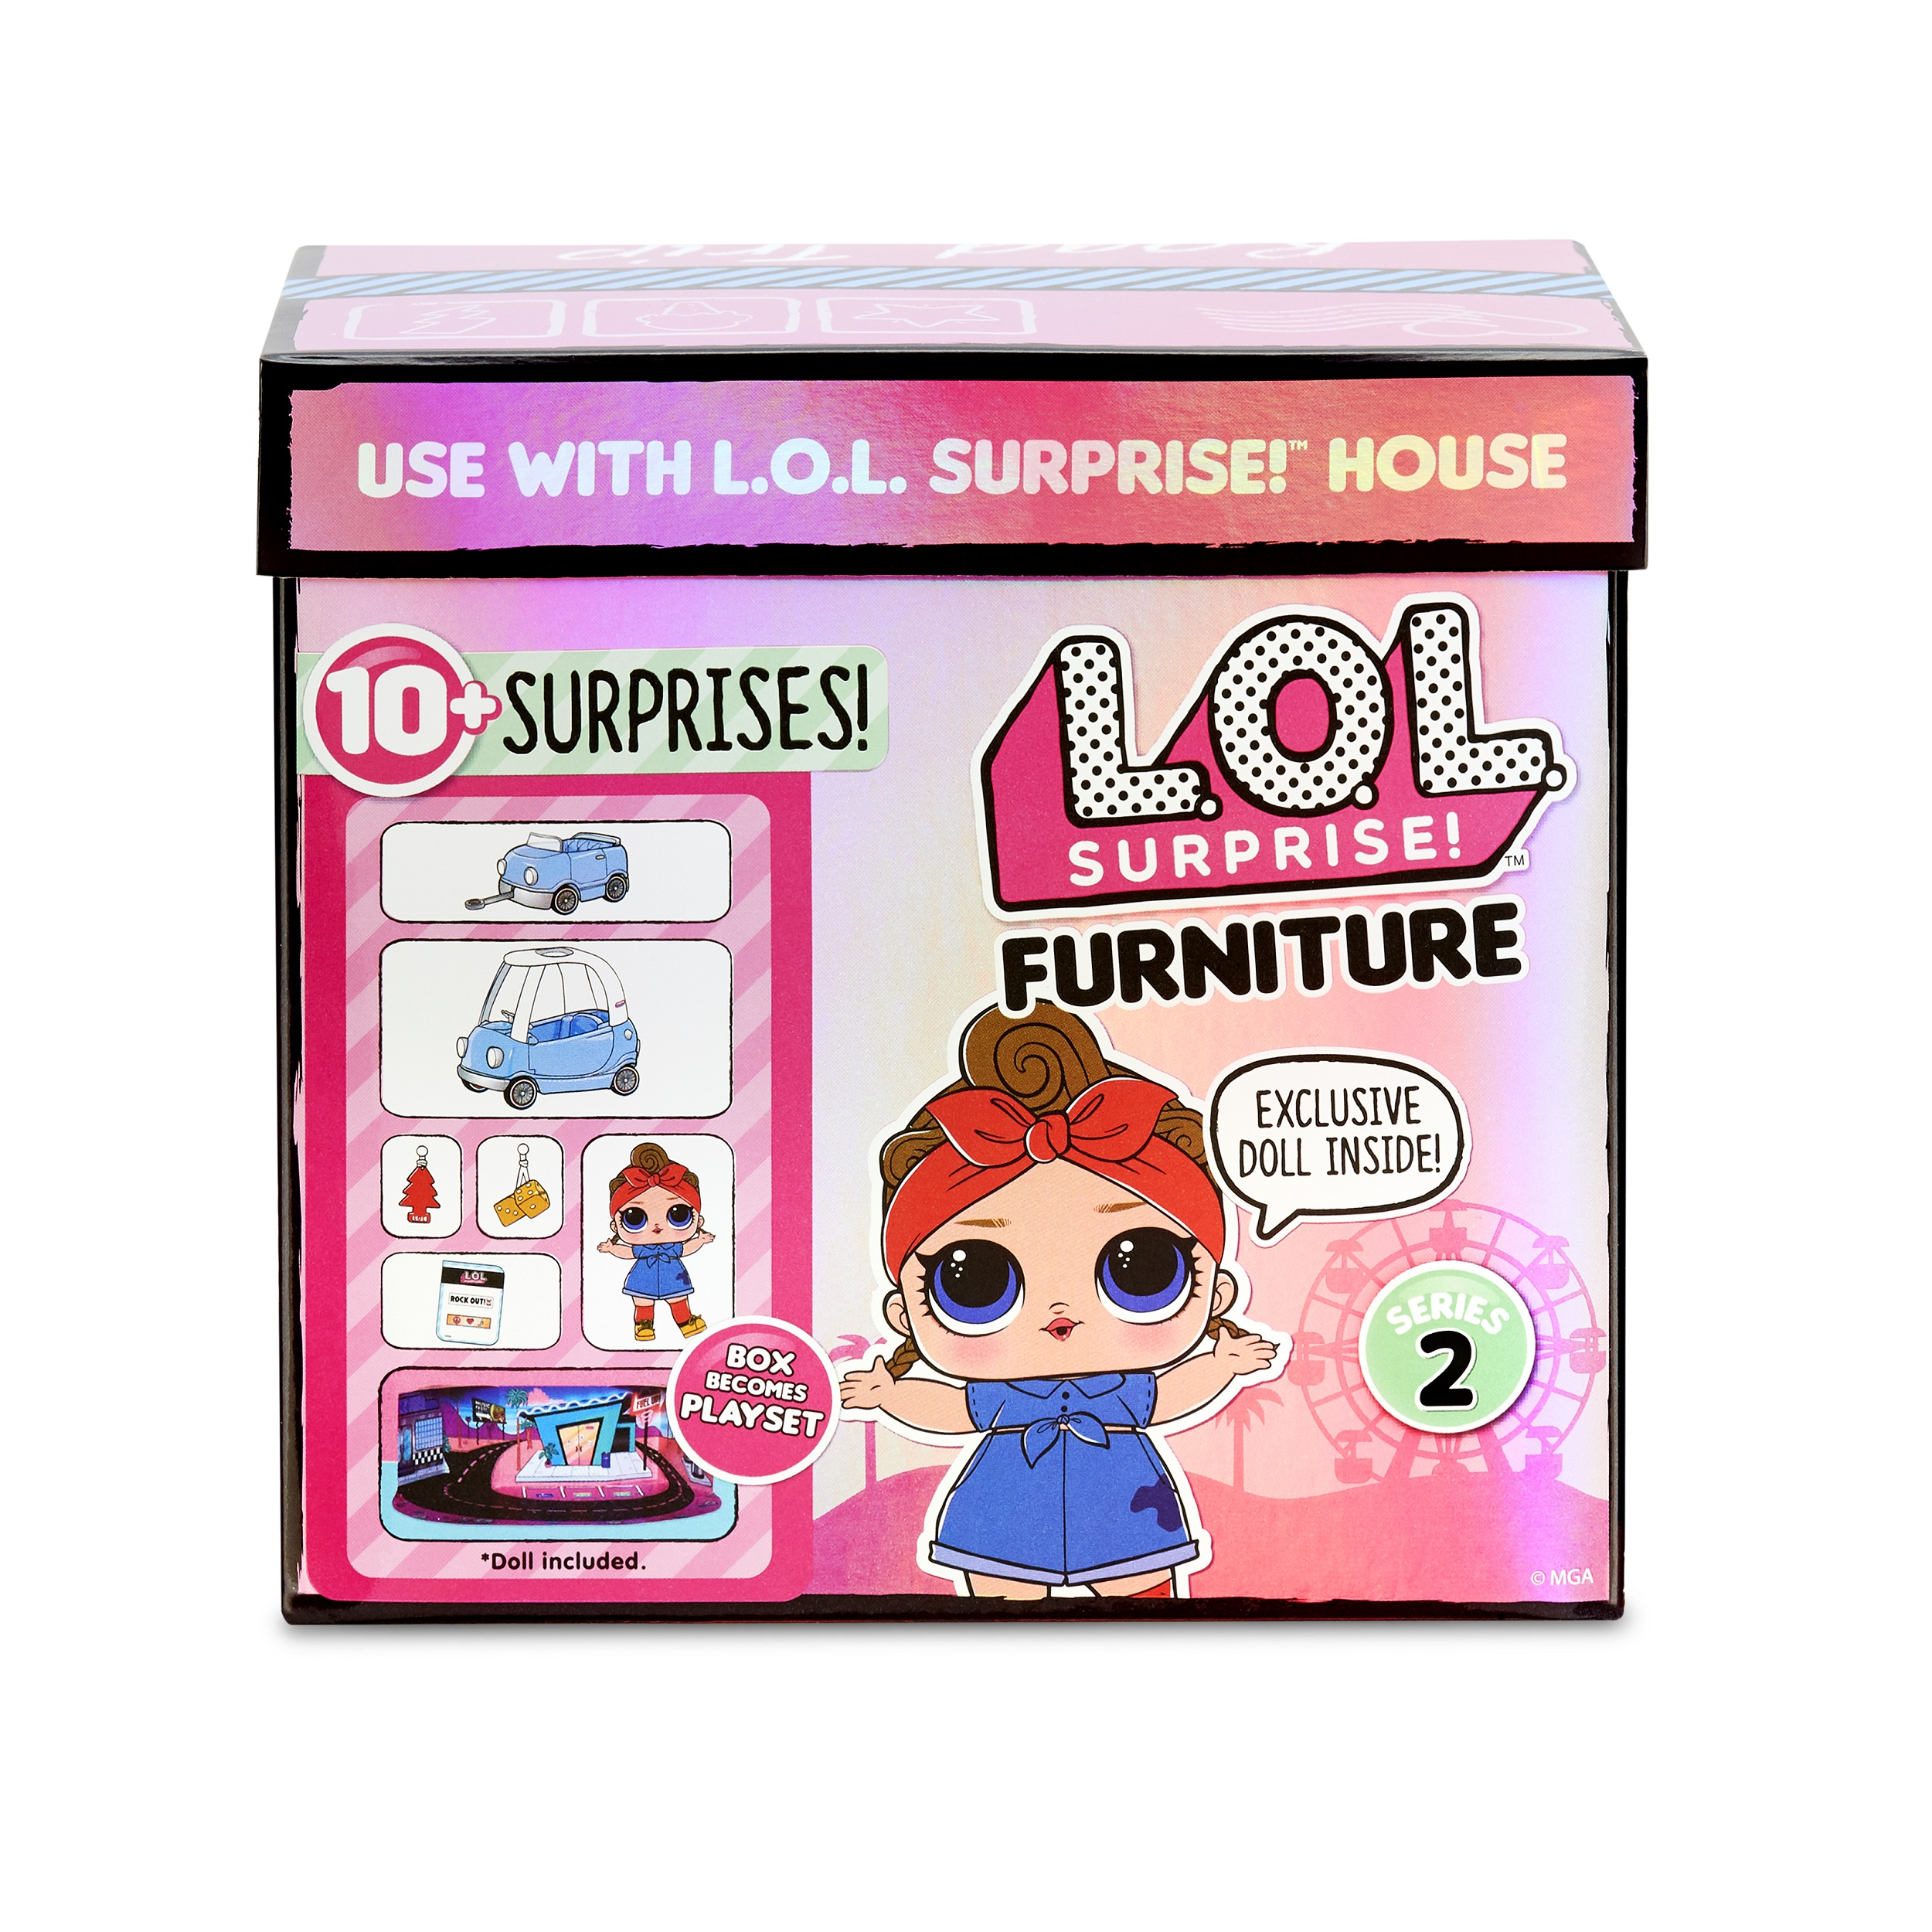 LOL Surprise Doll SIS SWING Series 1 Doll opened